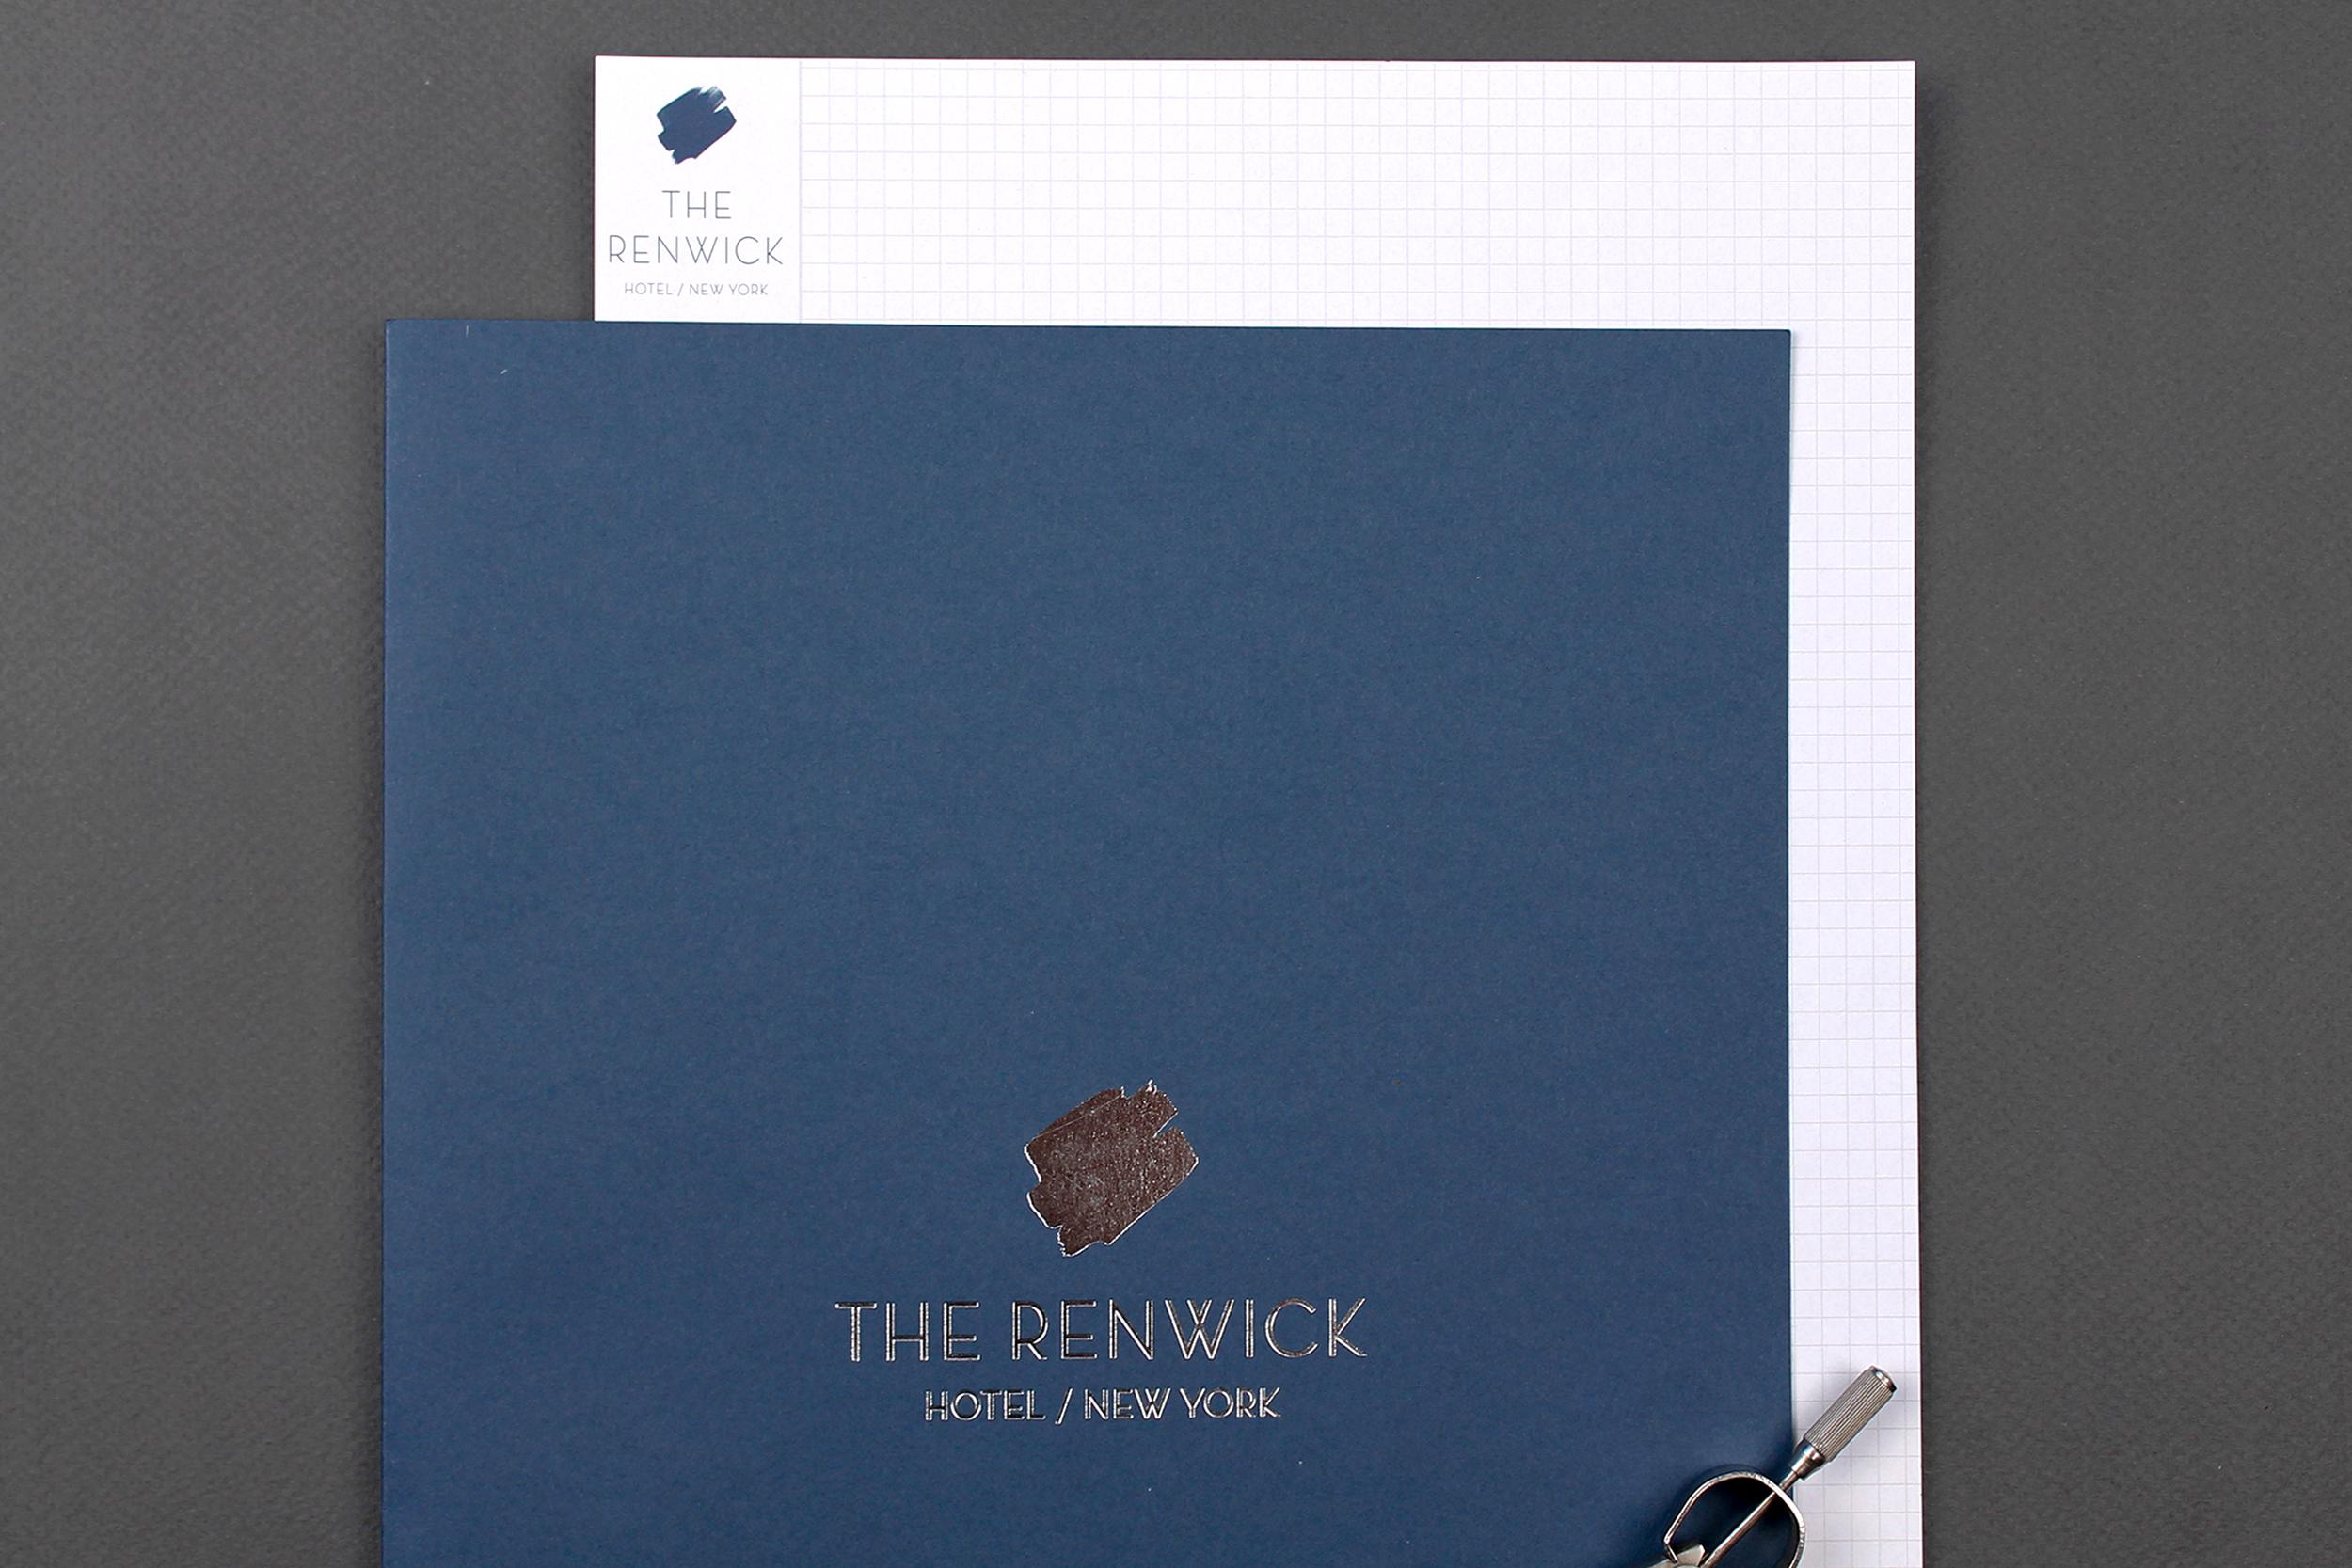 The Renwick [hospitality]